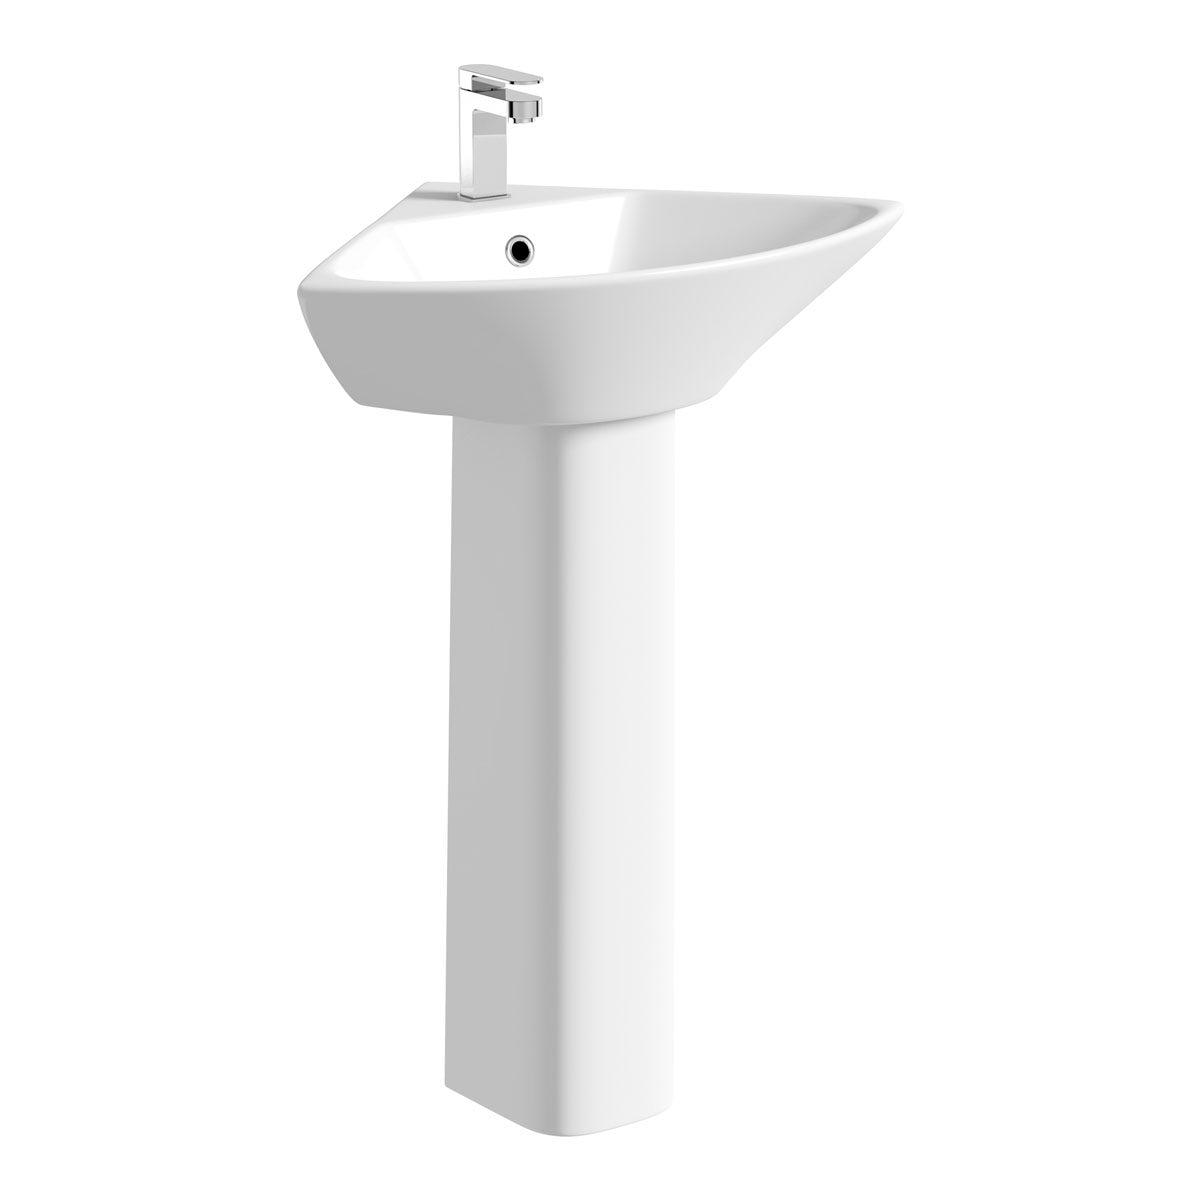 Compact corner 1 tap hole full pedestal basin 450mm